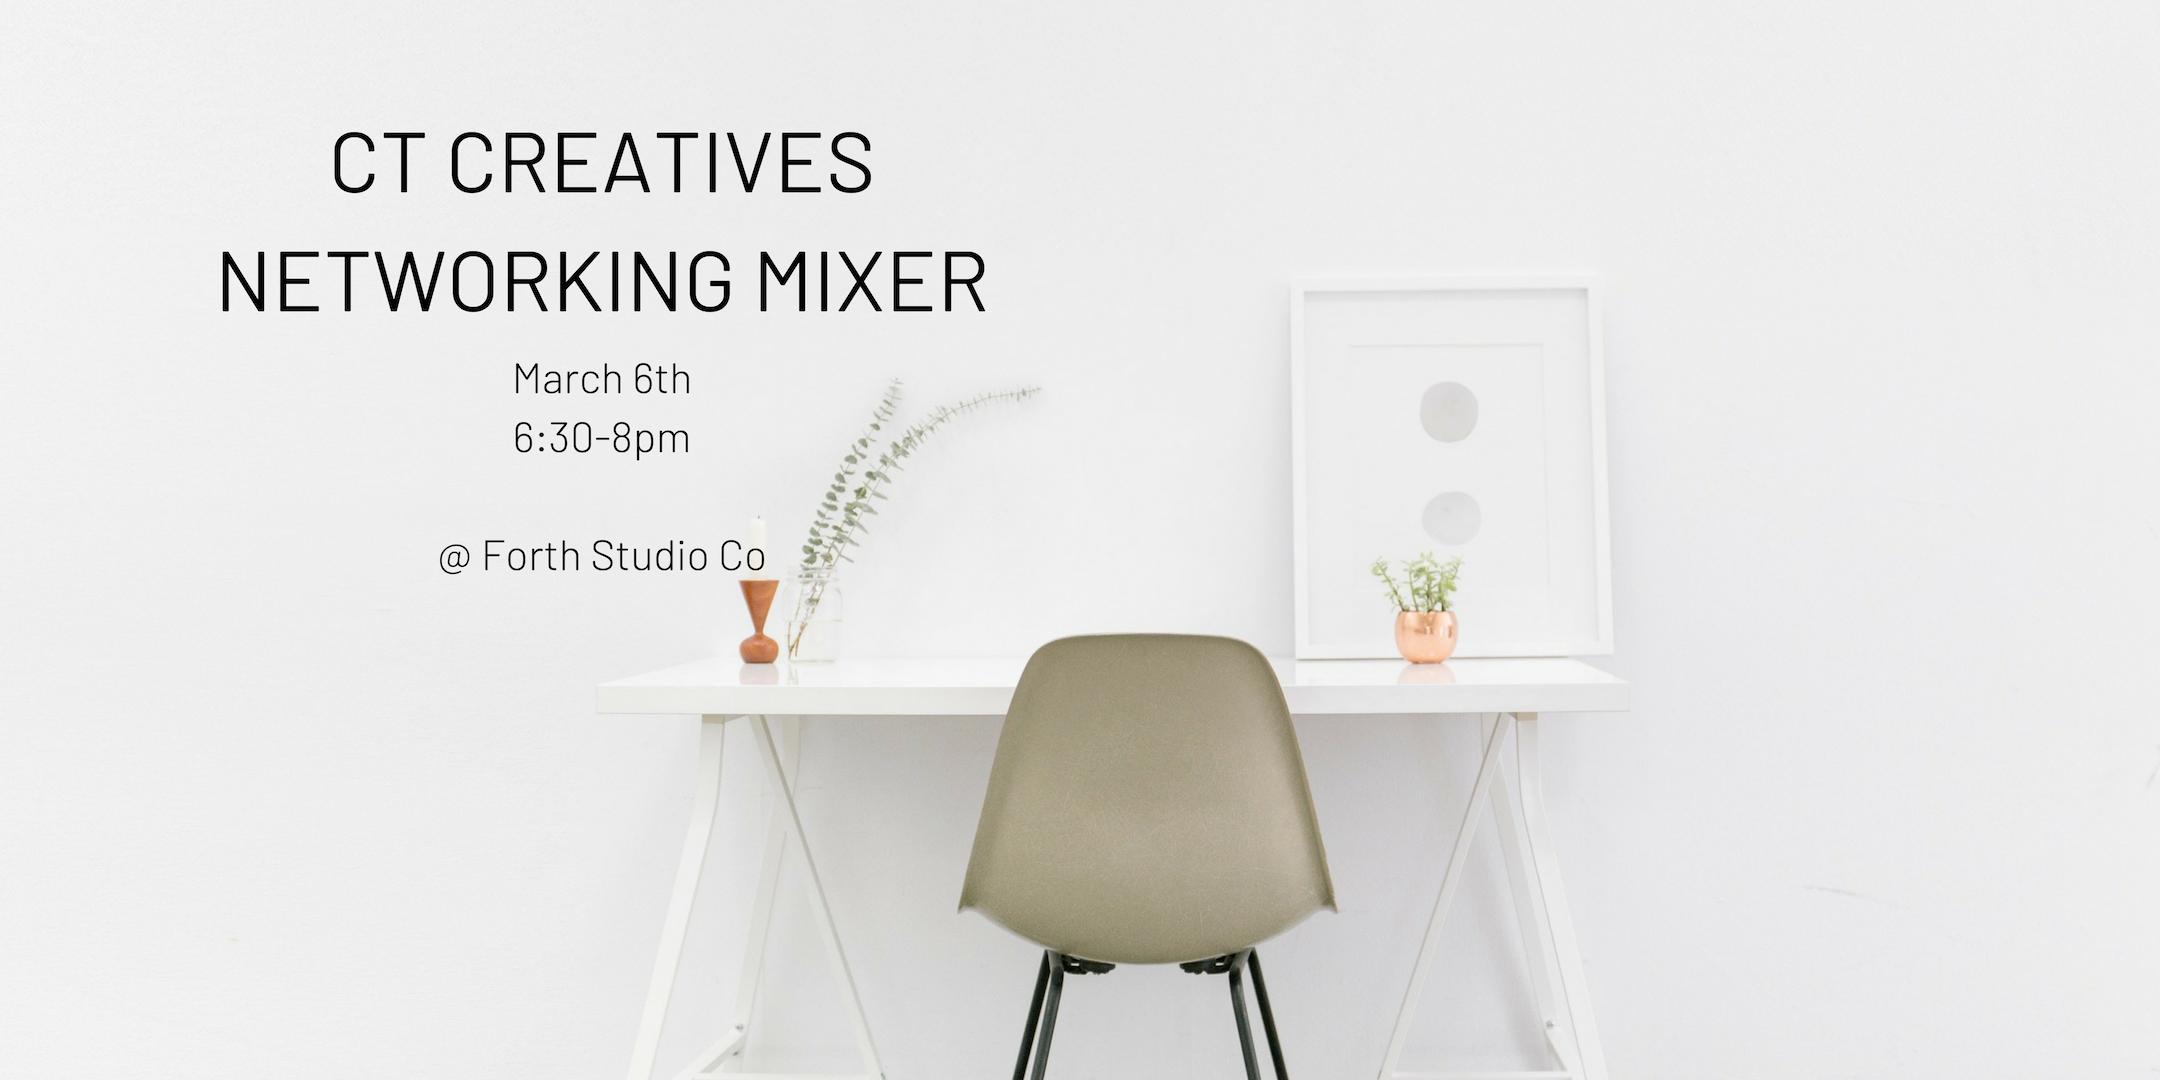 CT CREATIVES NETWORKING MIXER (4).png